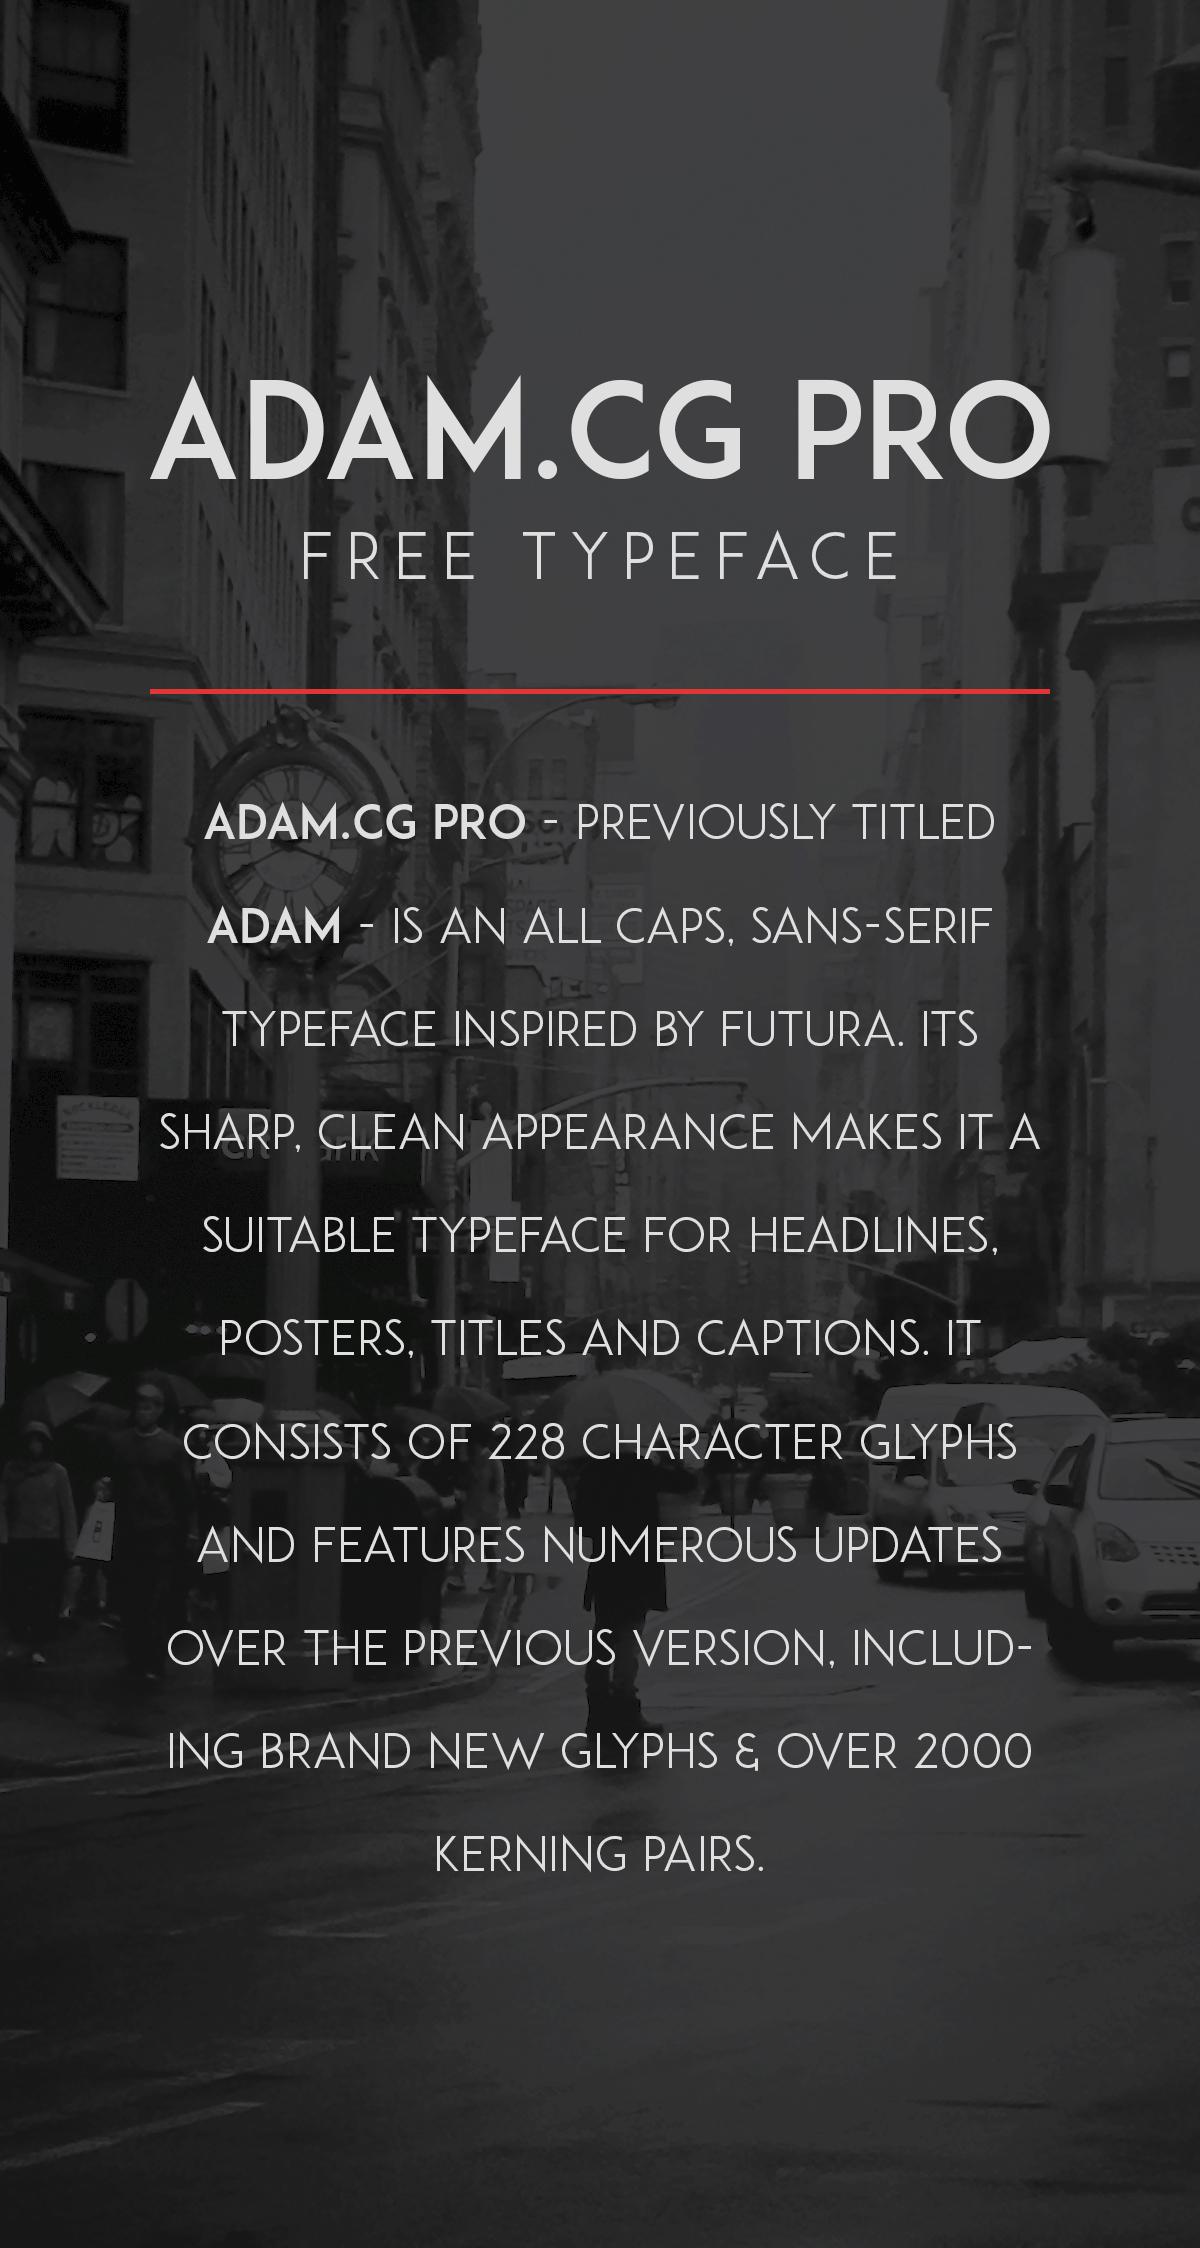 ADAM.CG PRO